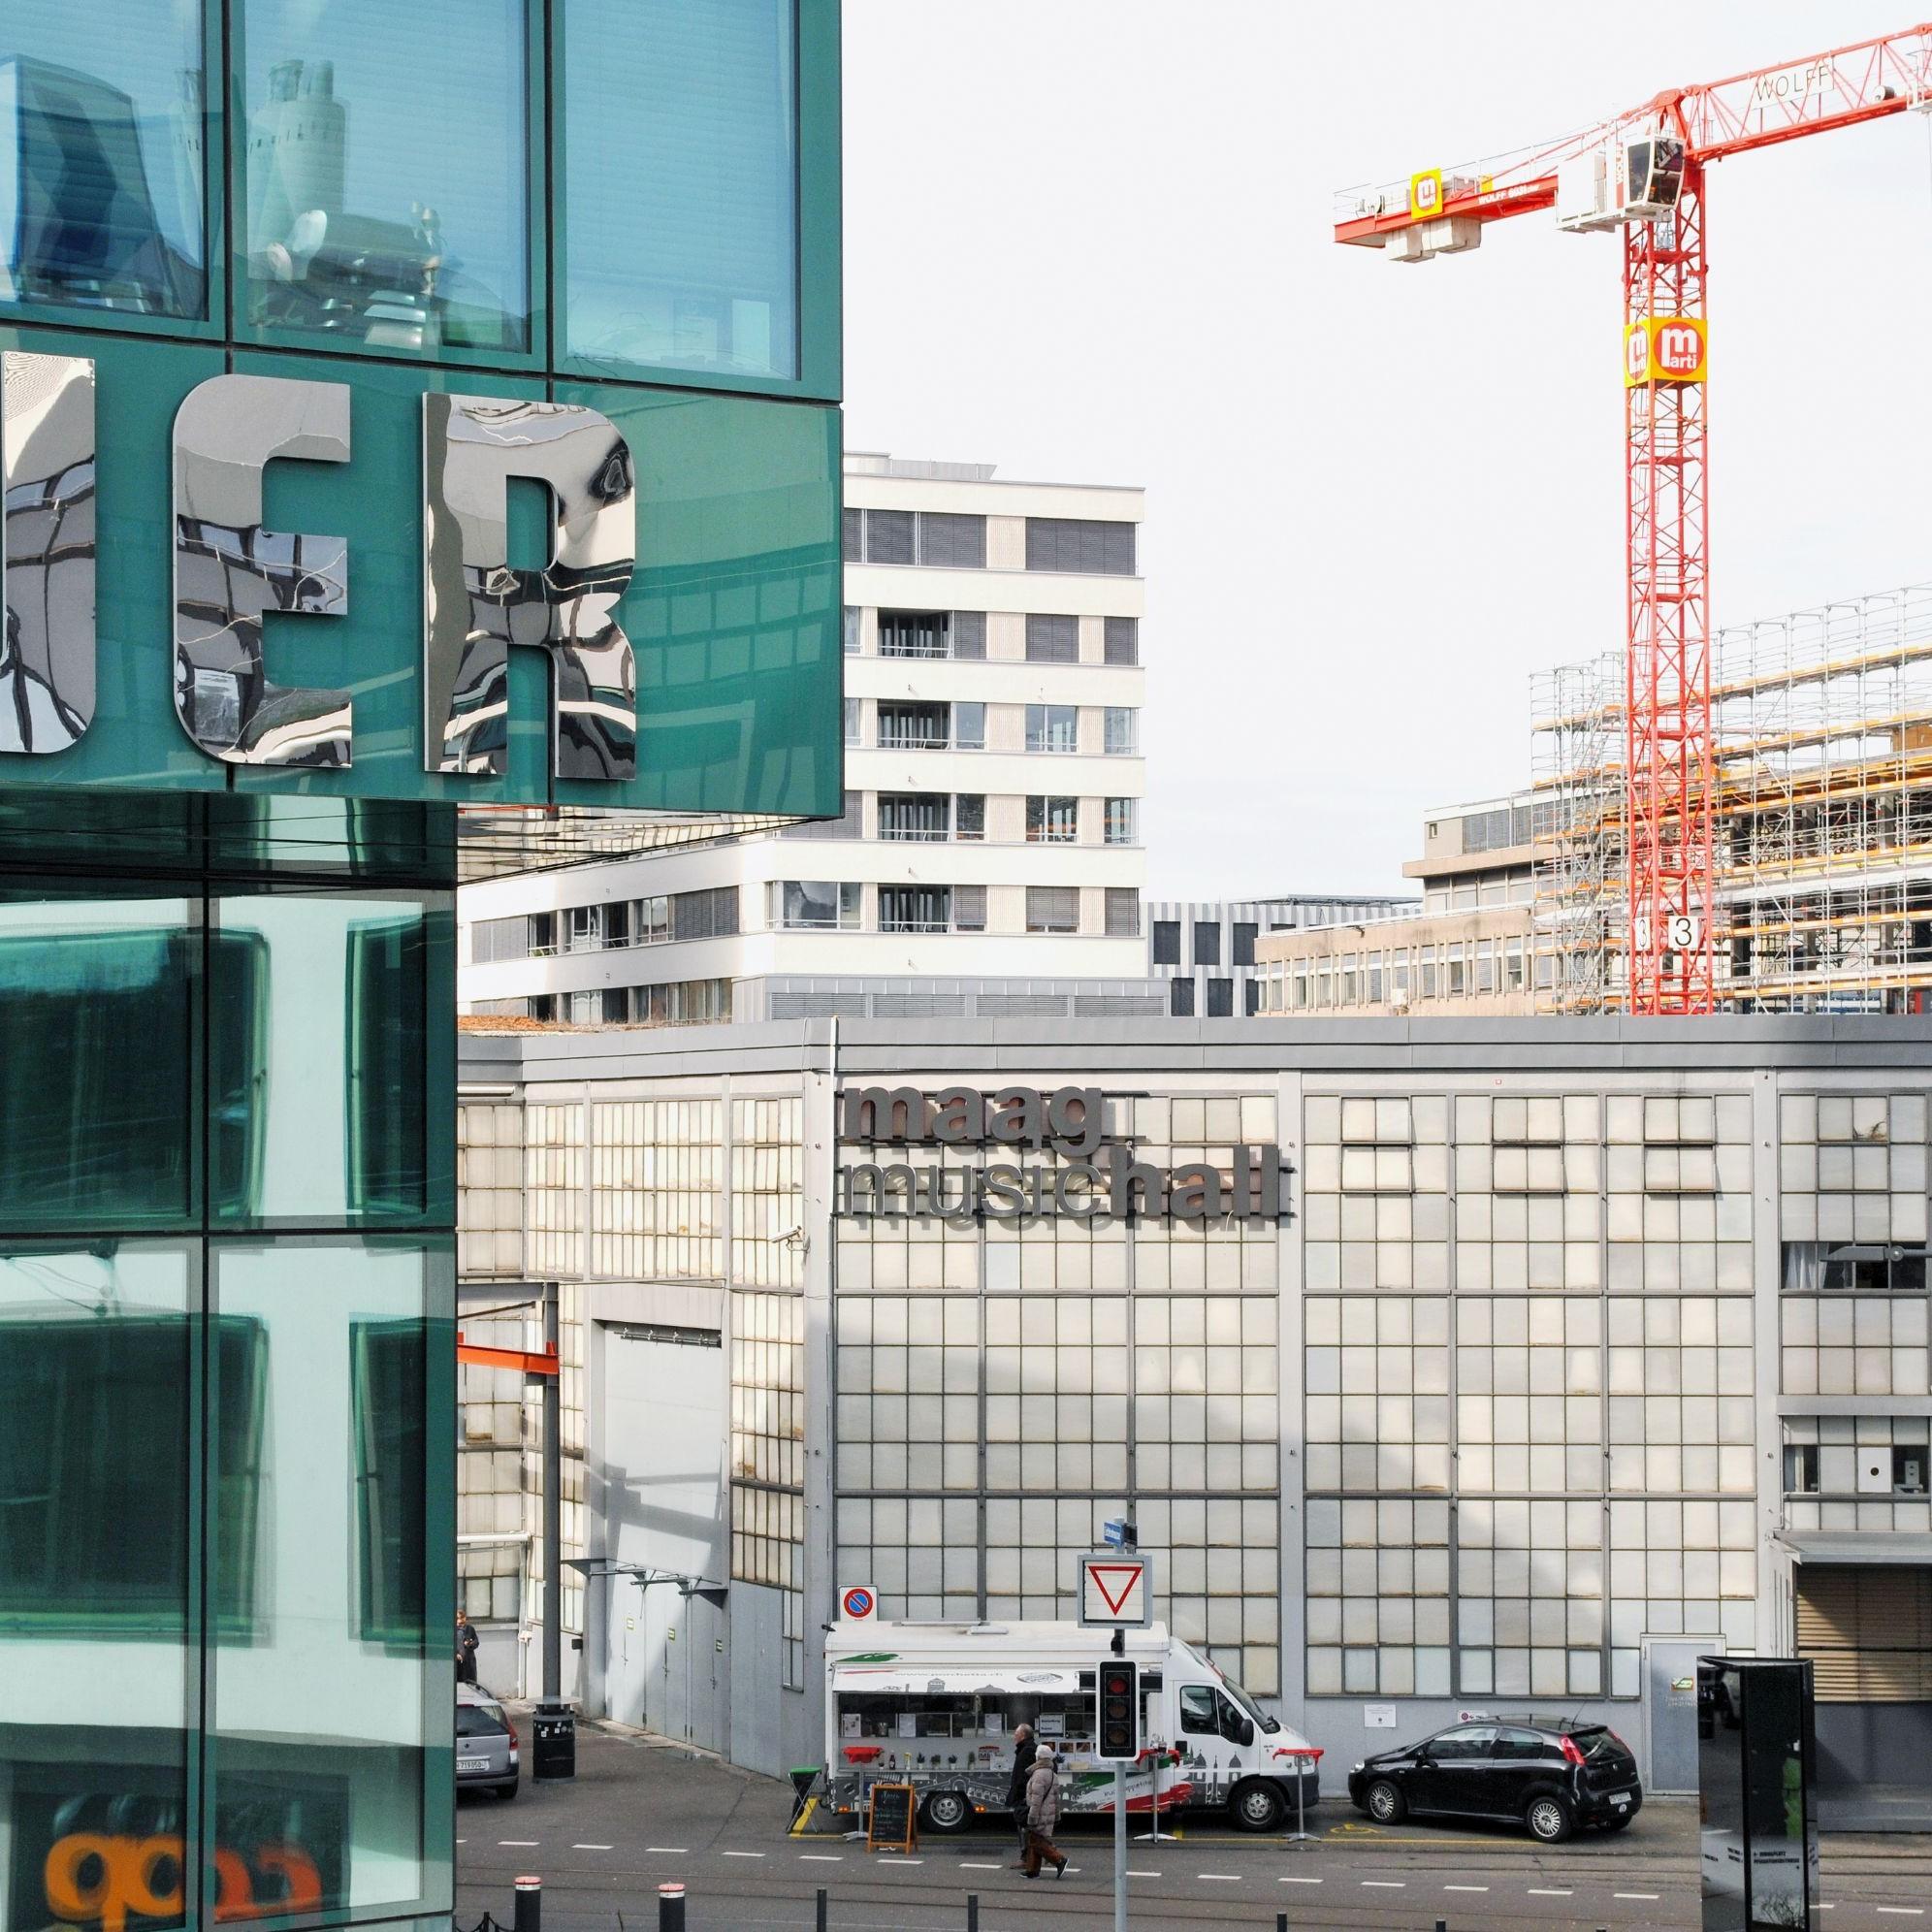 Maagareal Zürich, Symbolbild.